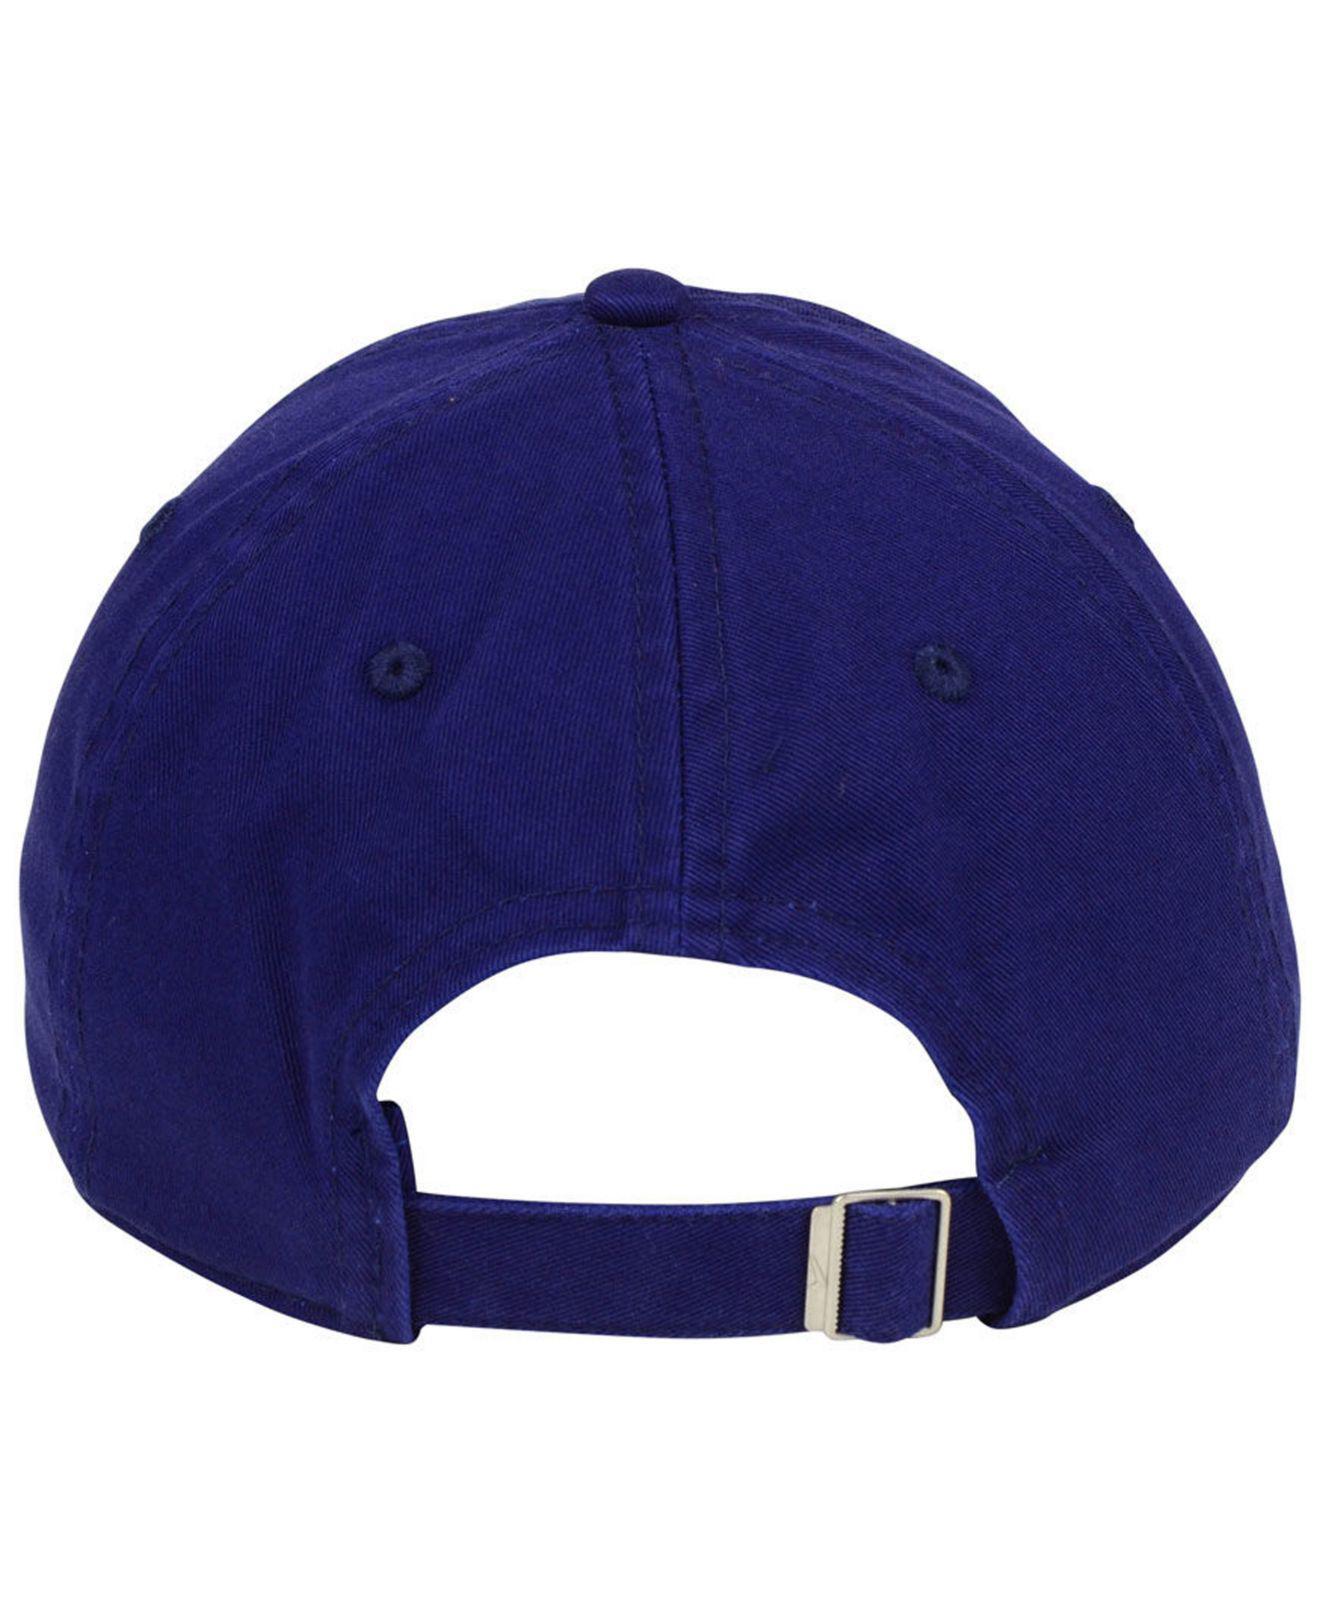 big sale c9647 8d7c6 ... purchase nike blue texas rangers micro cap for men lyst. view  fullscreen eadb1 fd862